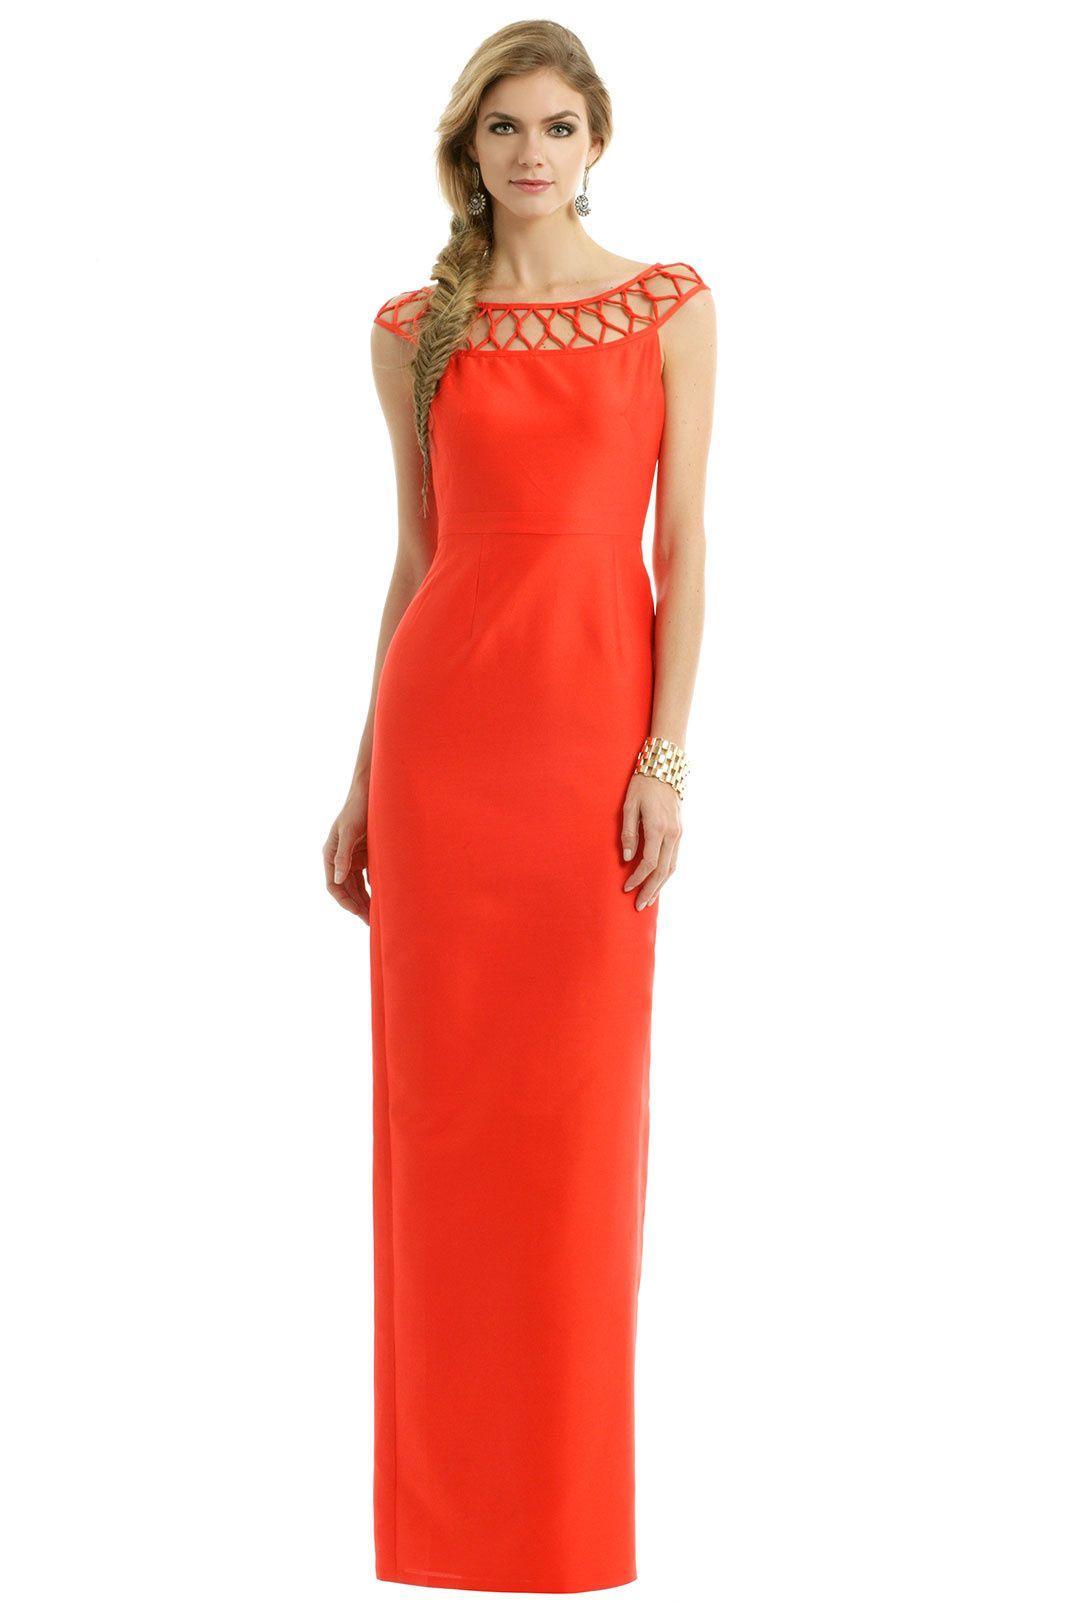 Raoul Citrus Cherry Twist Gown Dresses Gowns Floor Length Wedding Dress